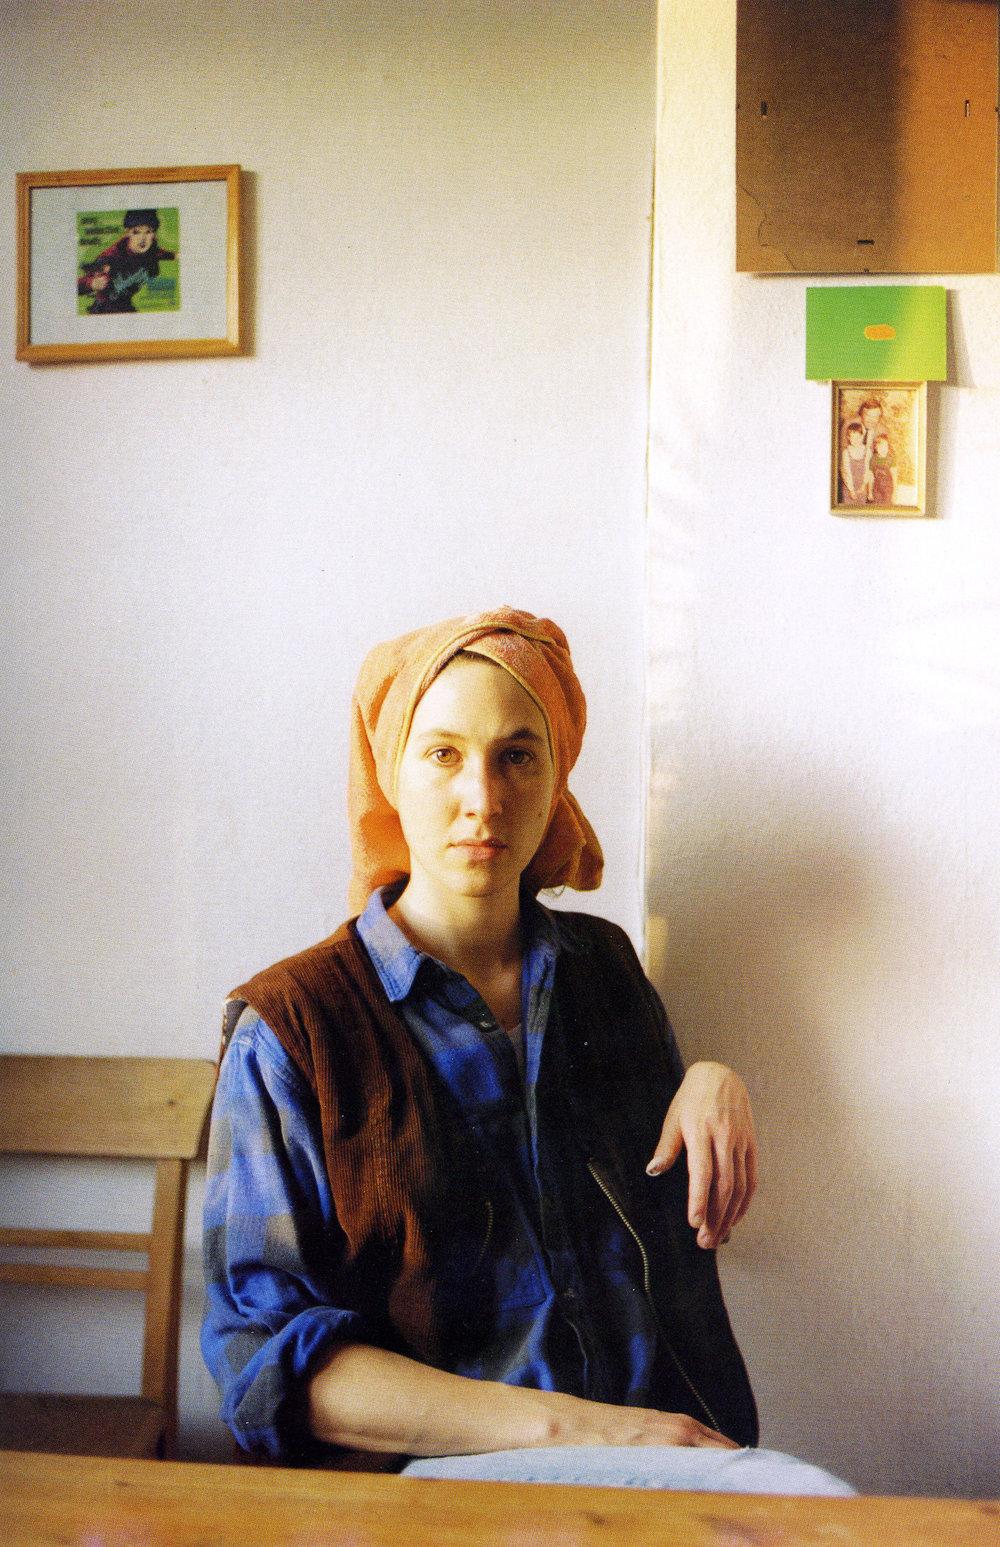 JITKA HANZLOVÁ  UNTITLED (TONJA), 1996 Photograph / Fotografie 30 x 19,5 cm Courtesy Georg Kargl Fine Arts, Vienna / Wien